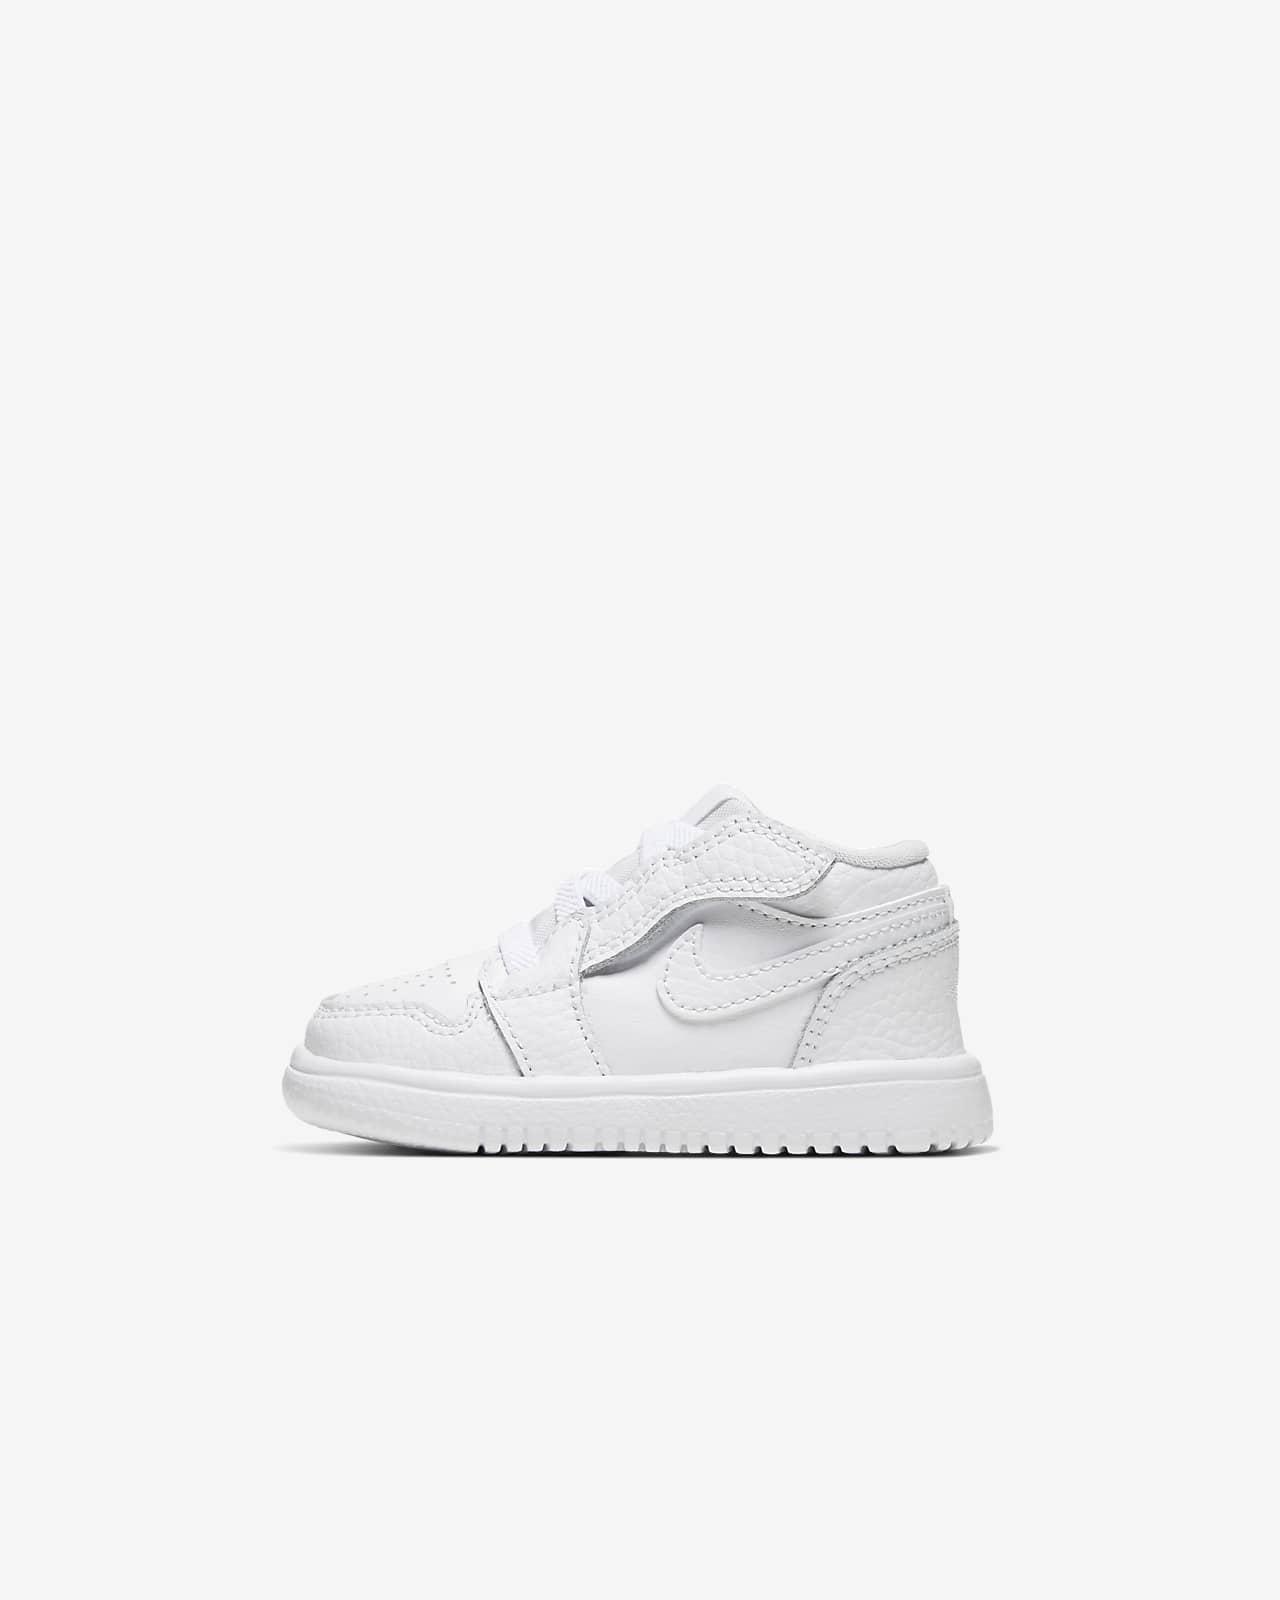 Jordan 1 Low Alt Baby & Toddler Shoes